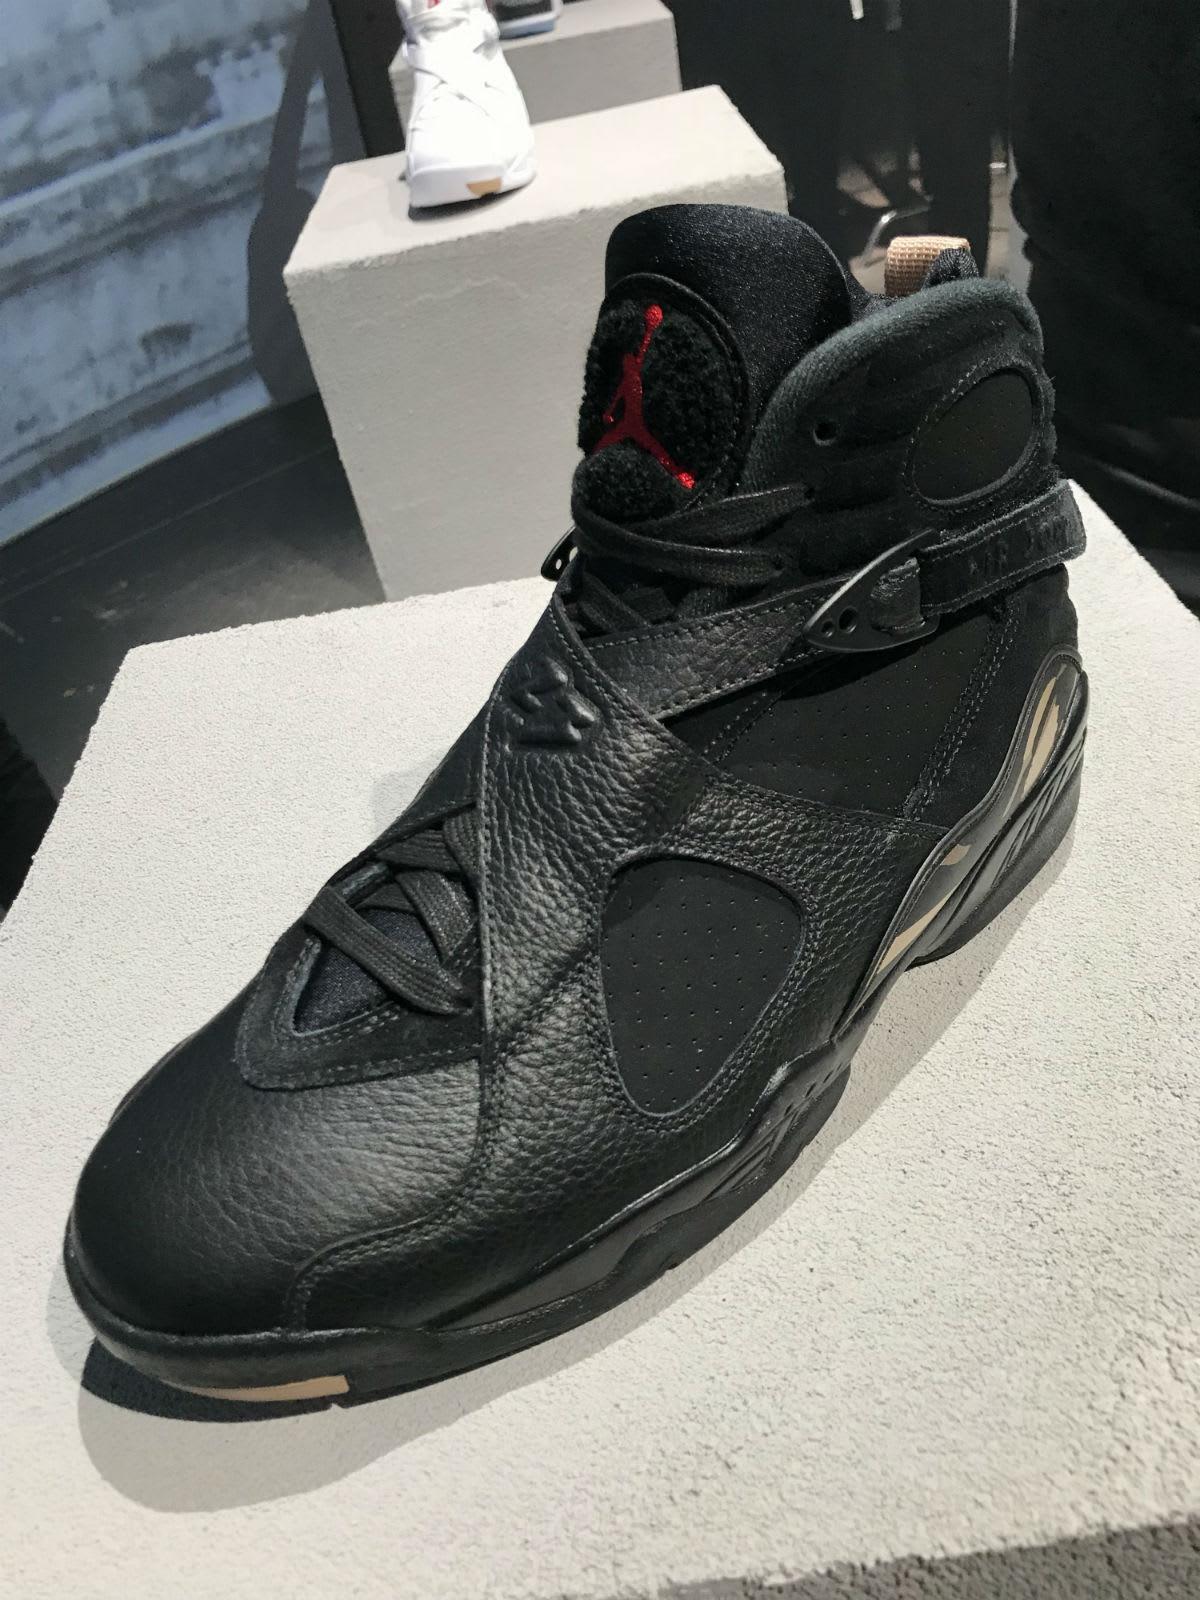 OVO Air Jordan 8 Black Release Date AA1239-045 Front